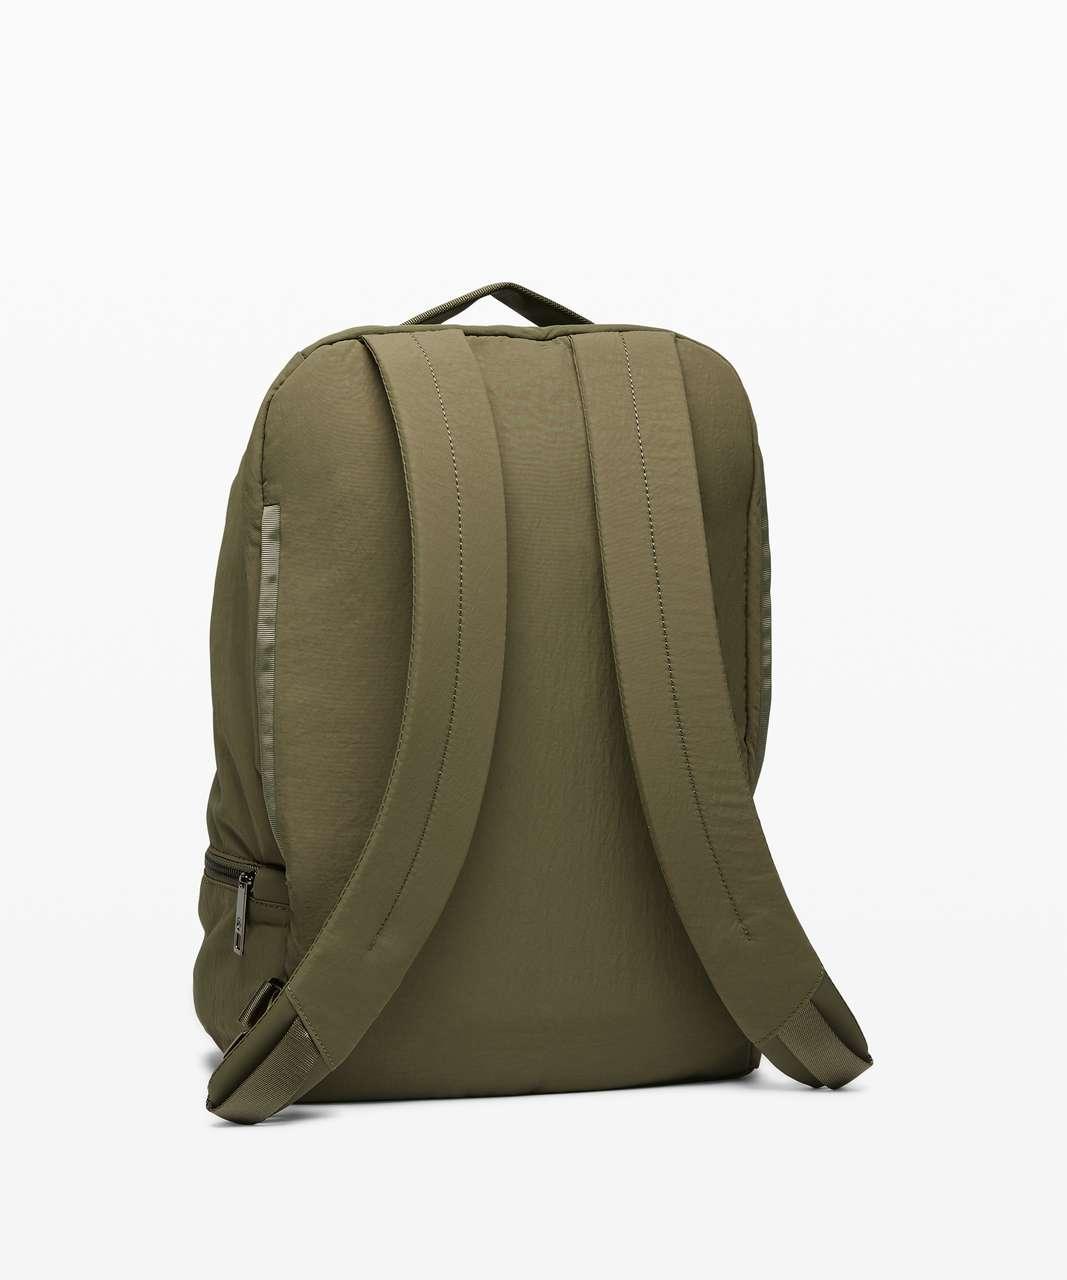 Lululemon City Adventurer Backpack *17L - Medium Olive / Lemon Vibe